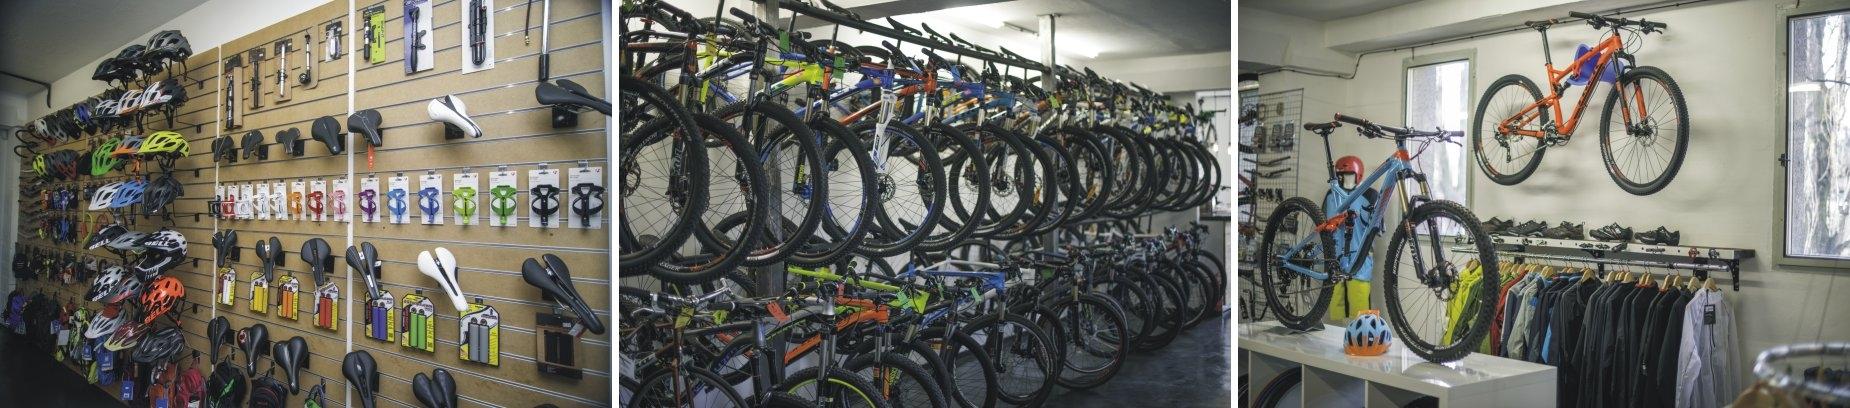 Obchod Krabcycles